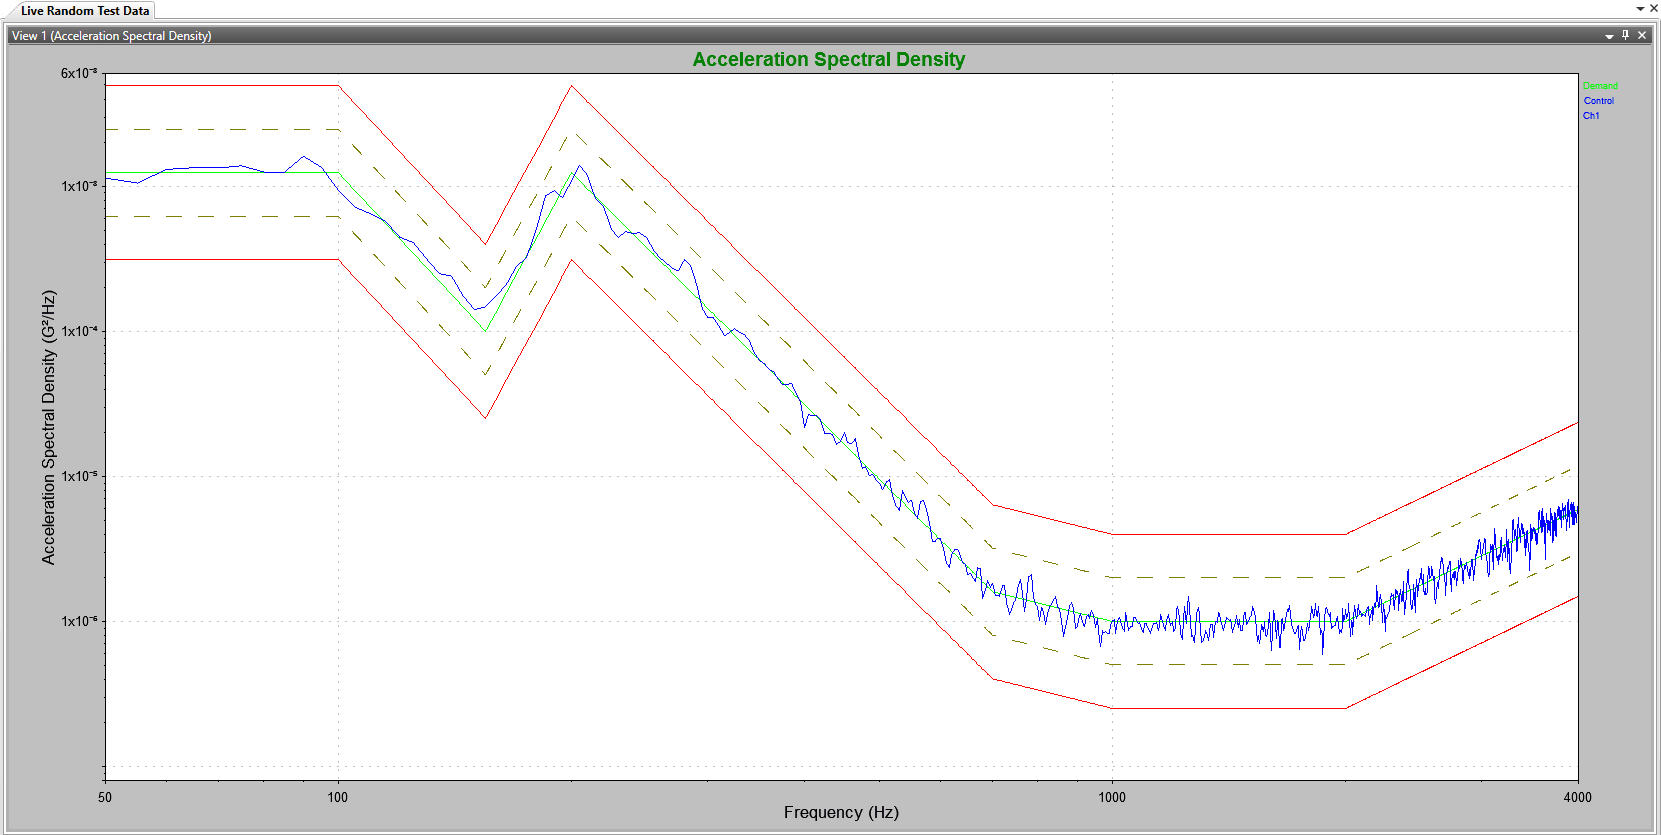 A RANDOM test profile from 50Hz to 4000Hz